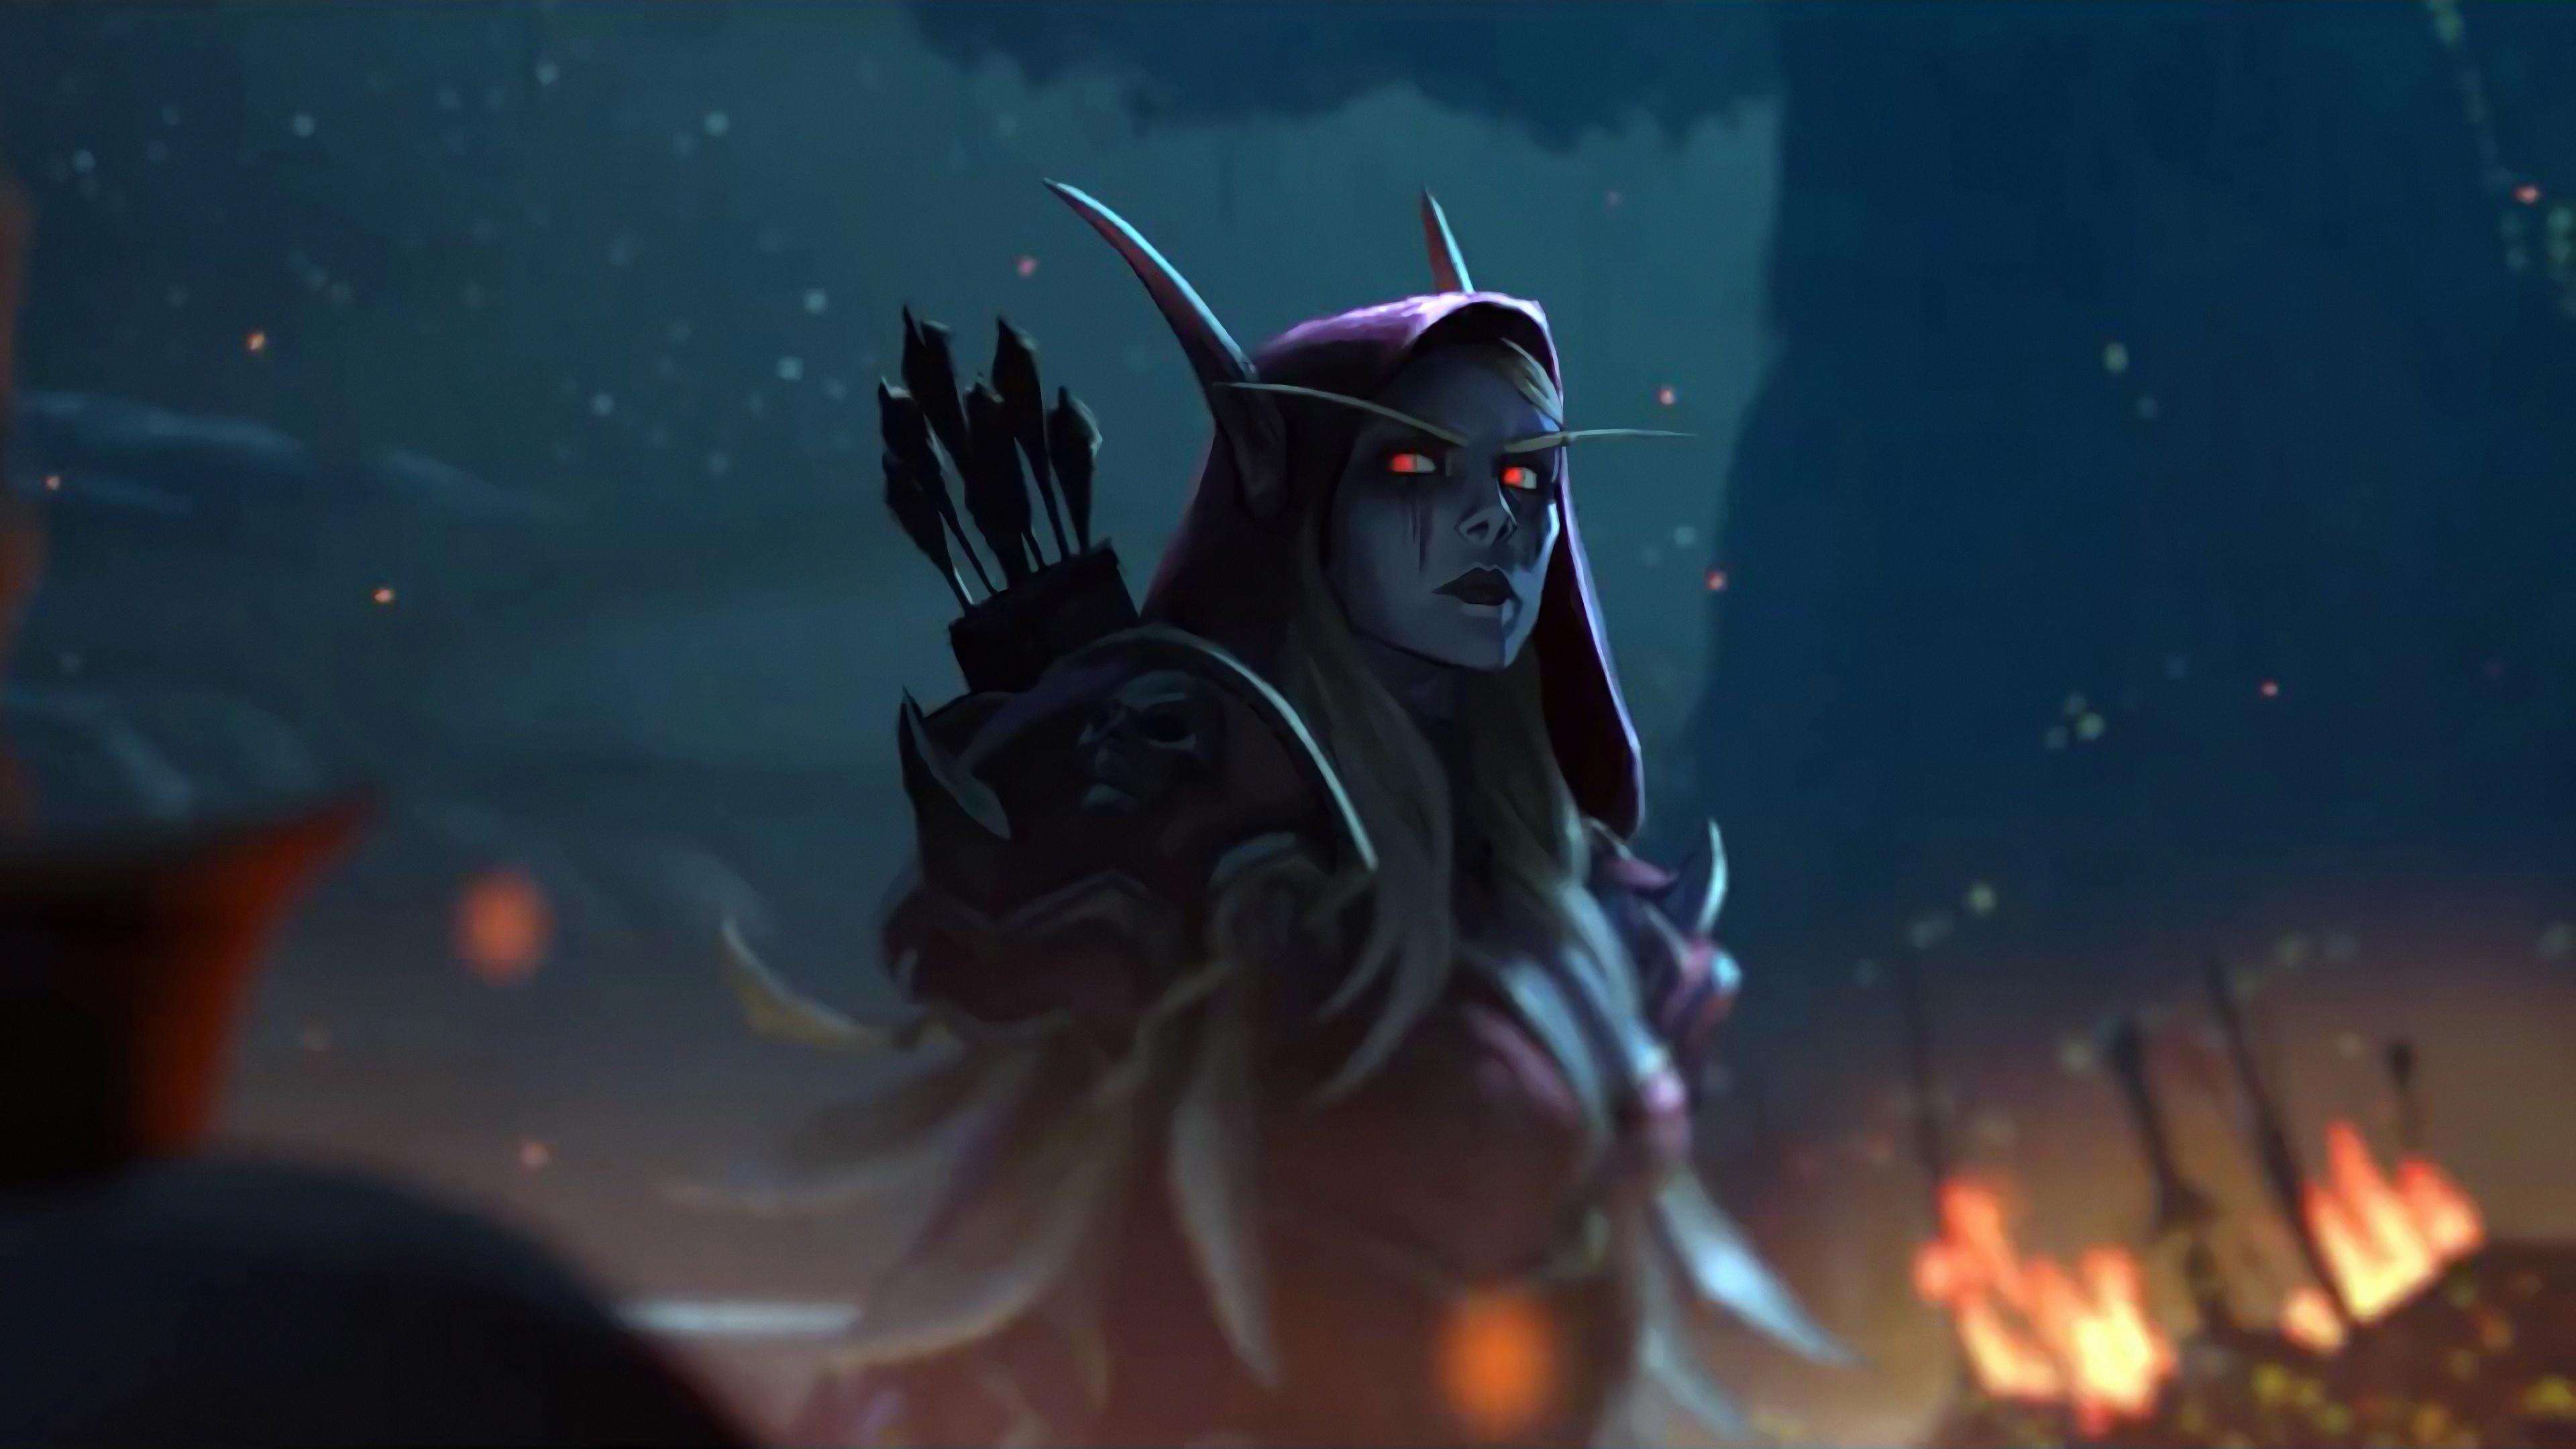 World Of Warcraft Wallpaper Hd Sylvanas Windrunner 4k 8k Hd World Of Warcraft Wallpaper 2